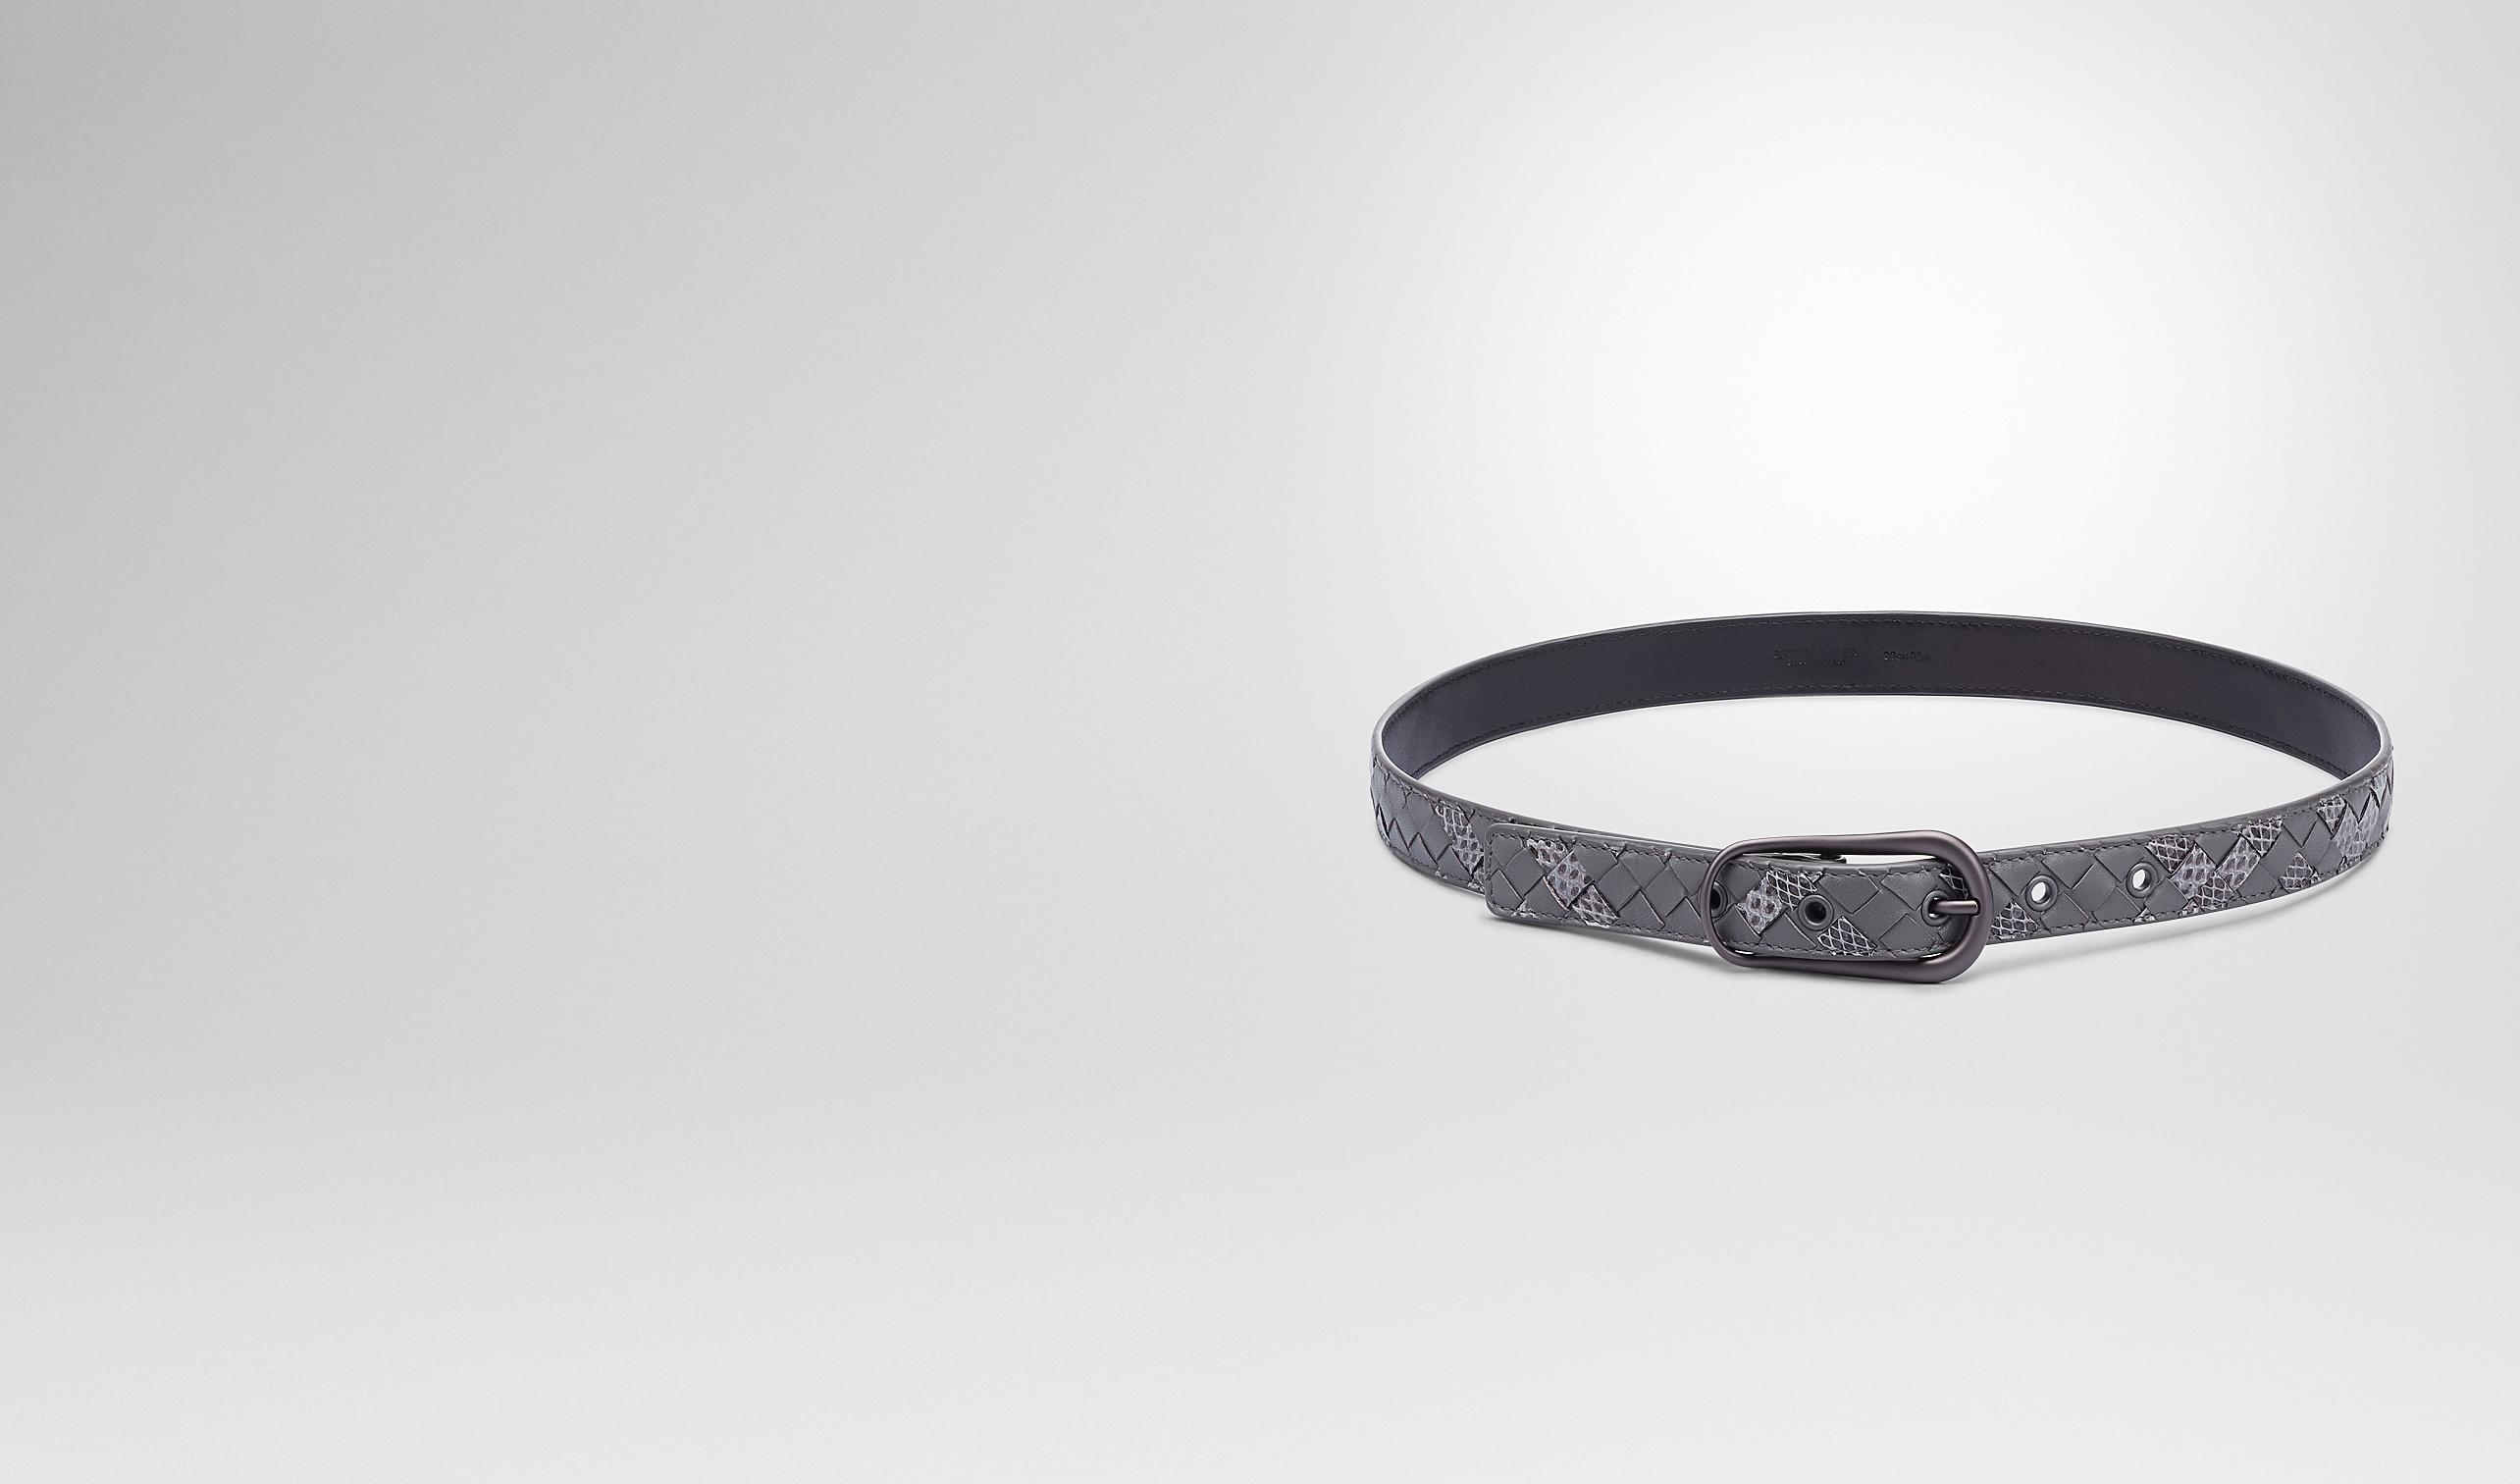 BOTTEGA VENETA Belt D New Light Grey Intrecciato Ayers Nappa Belt pl